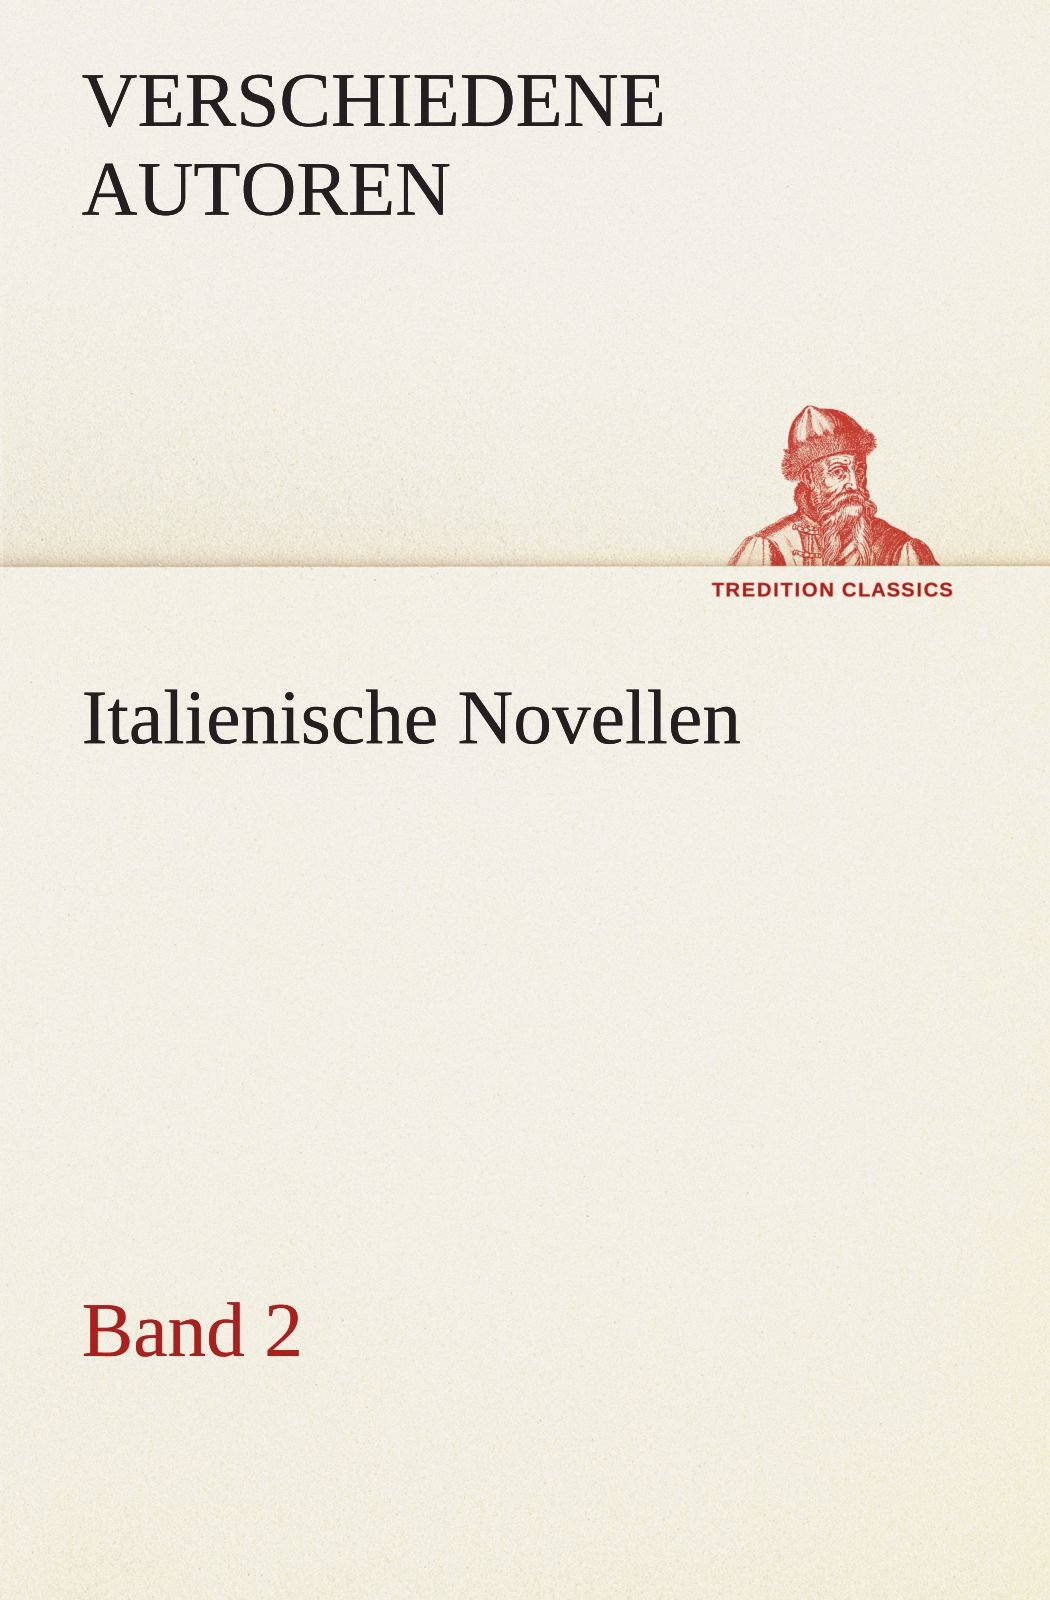 Italienische Novellen: Band 2 (TREDITION CLASSICS) (German Edition) ebook